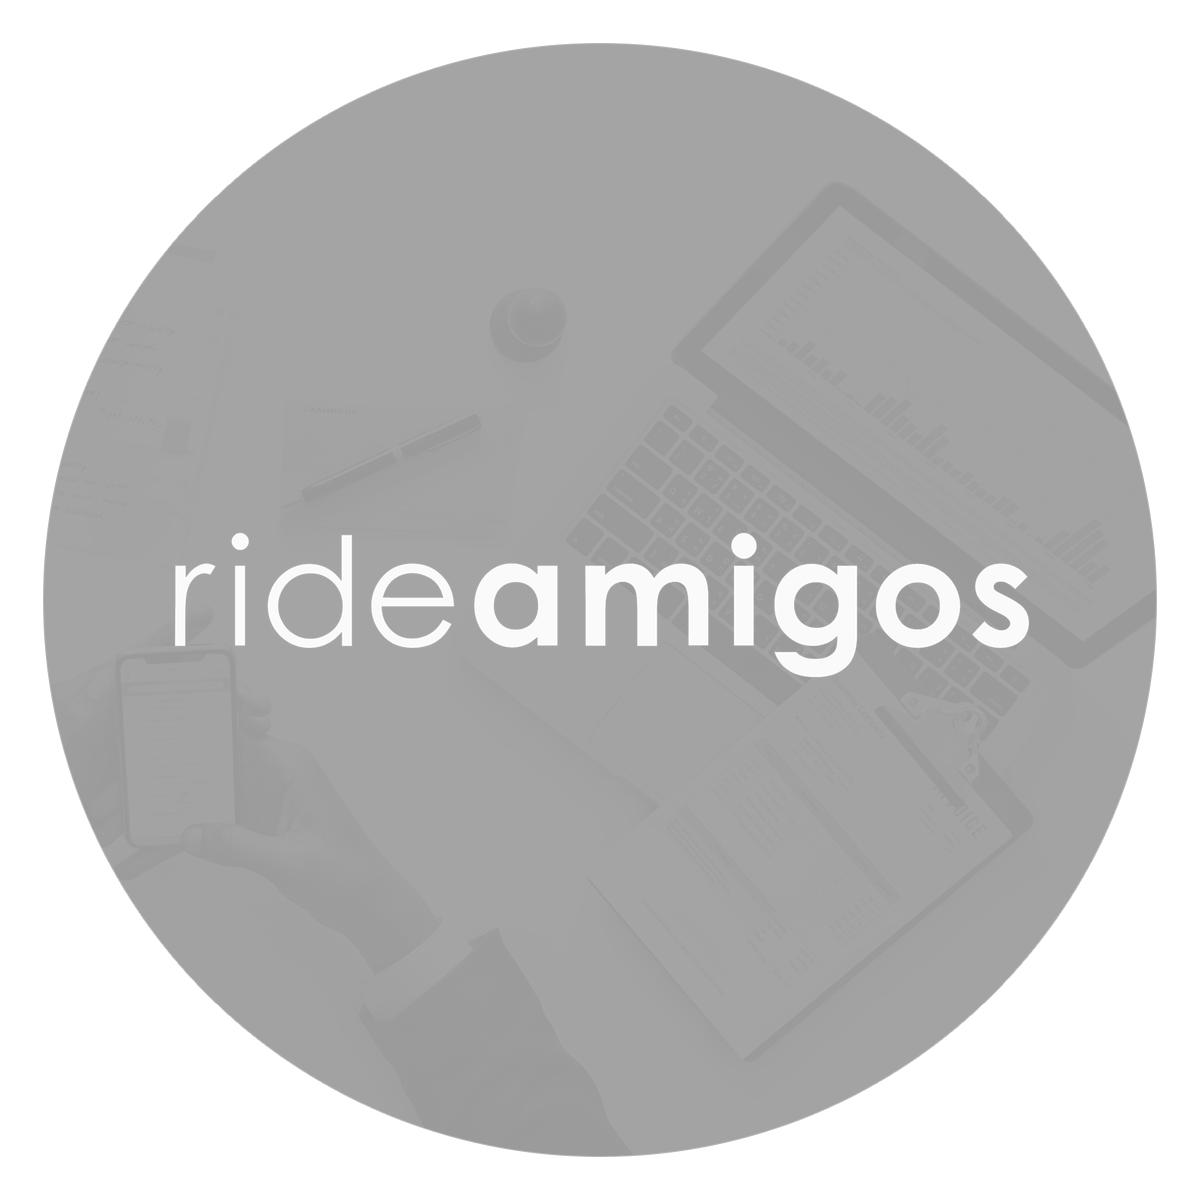 Ride Amigo Image - Circle.png